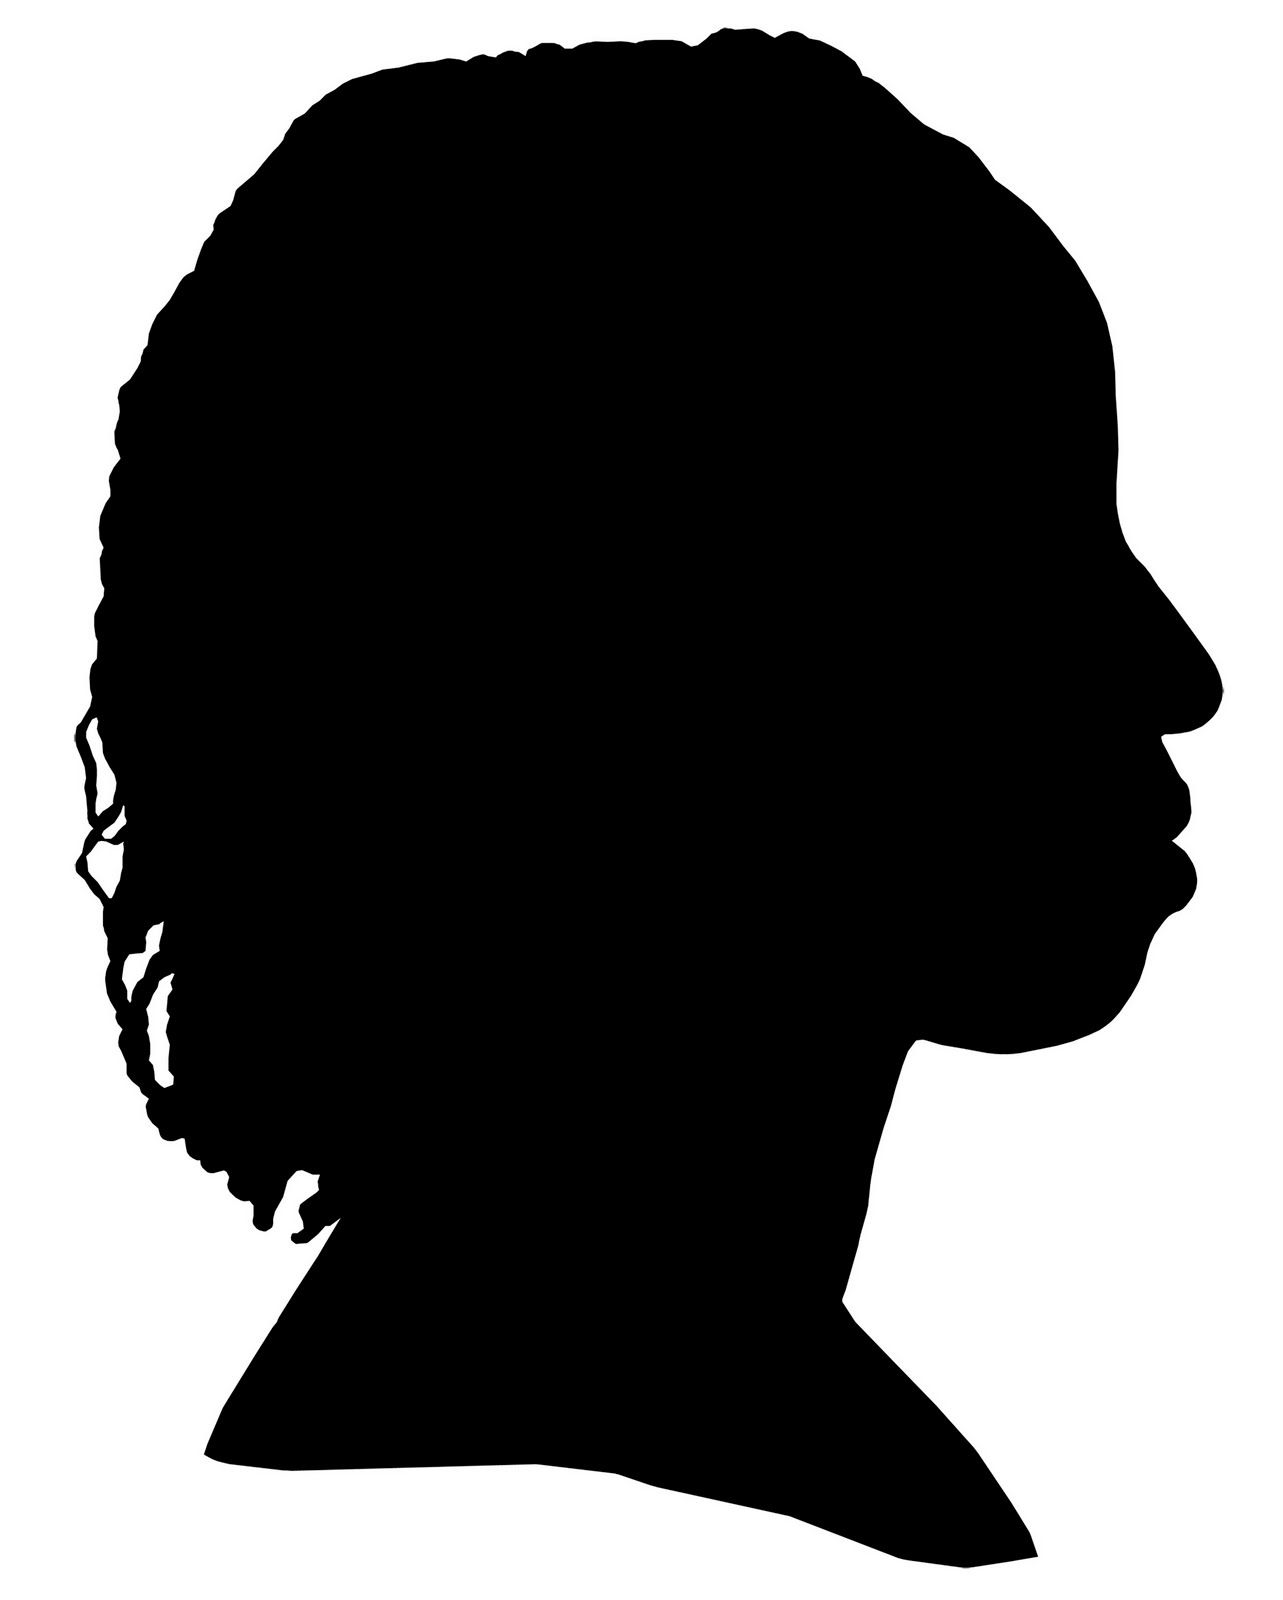 Woman Silhouette.